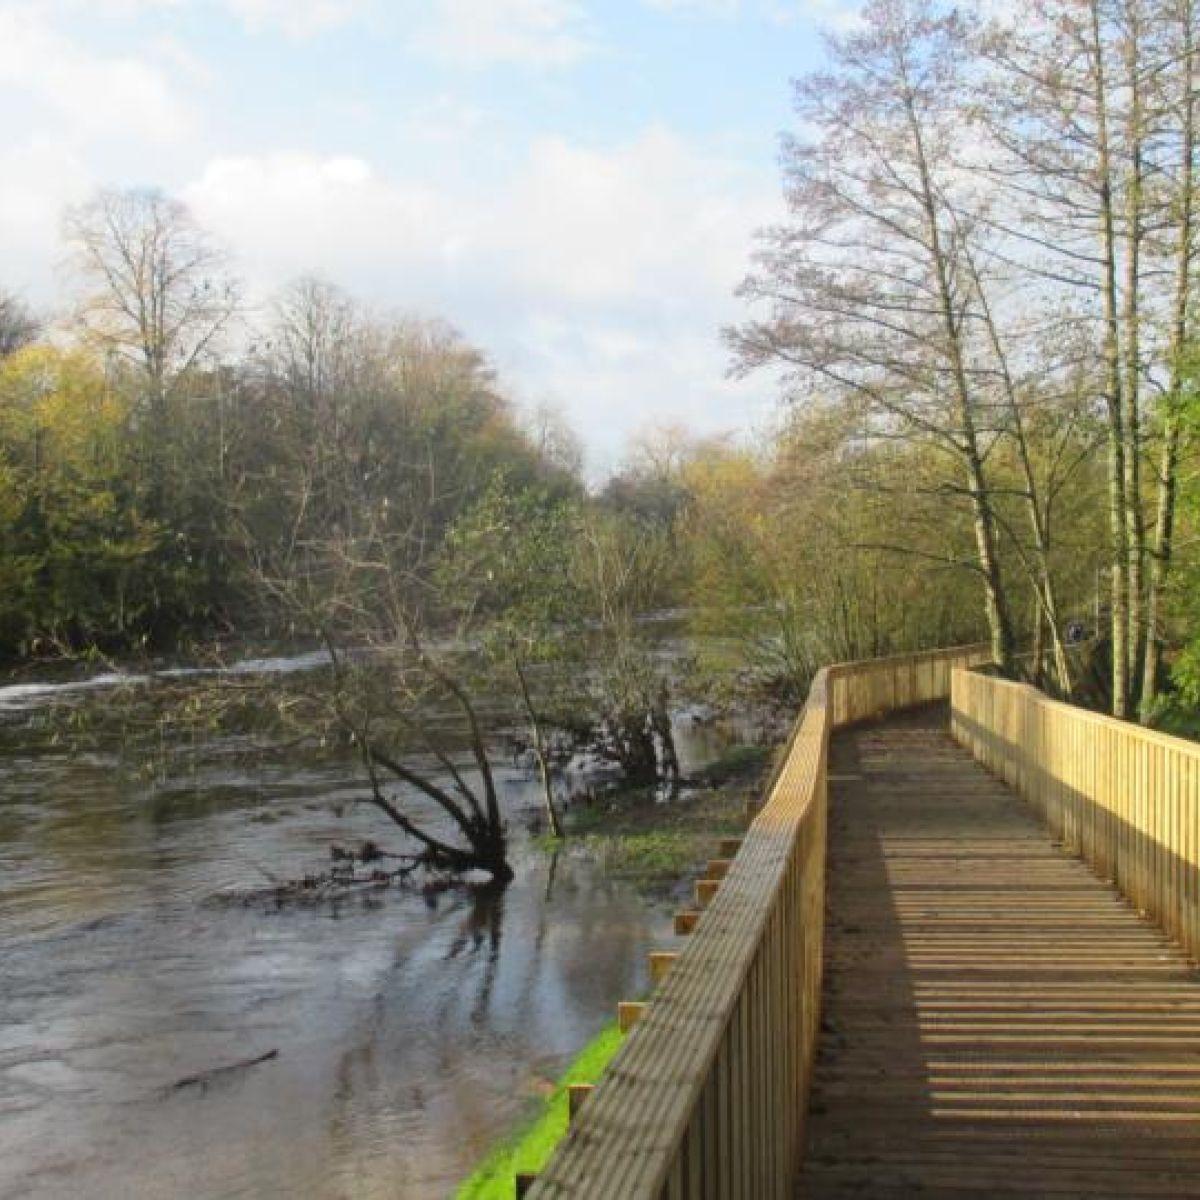 Nore Valley Walk (Kilkenny to Bennettsbridge section